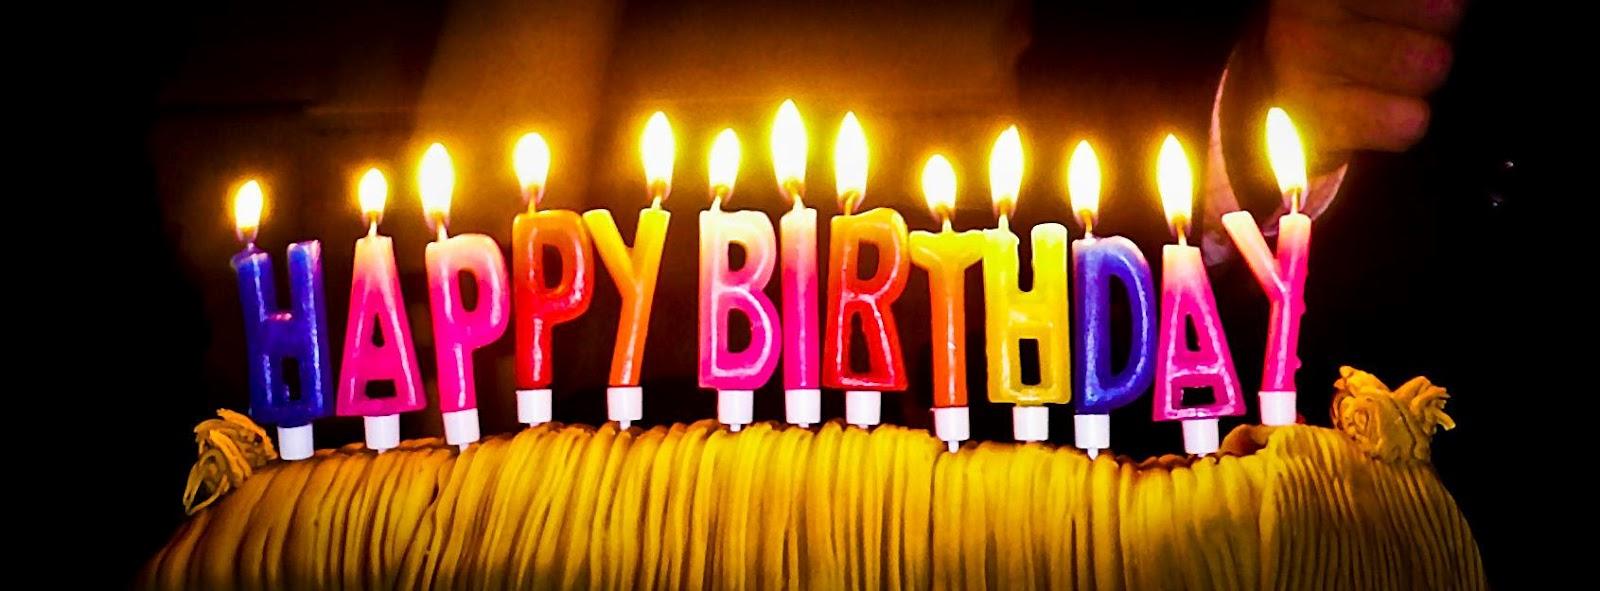 Happy Birthday Greetings For Facebook Wall Atletischsport